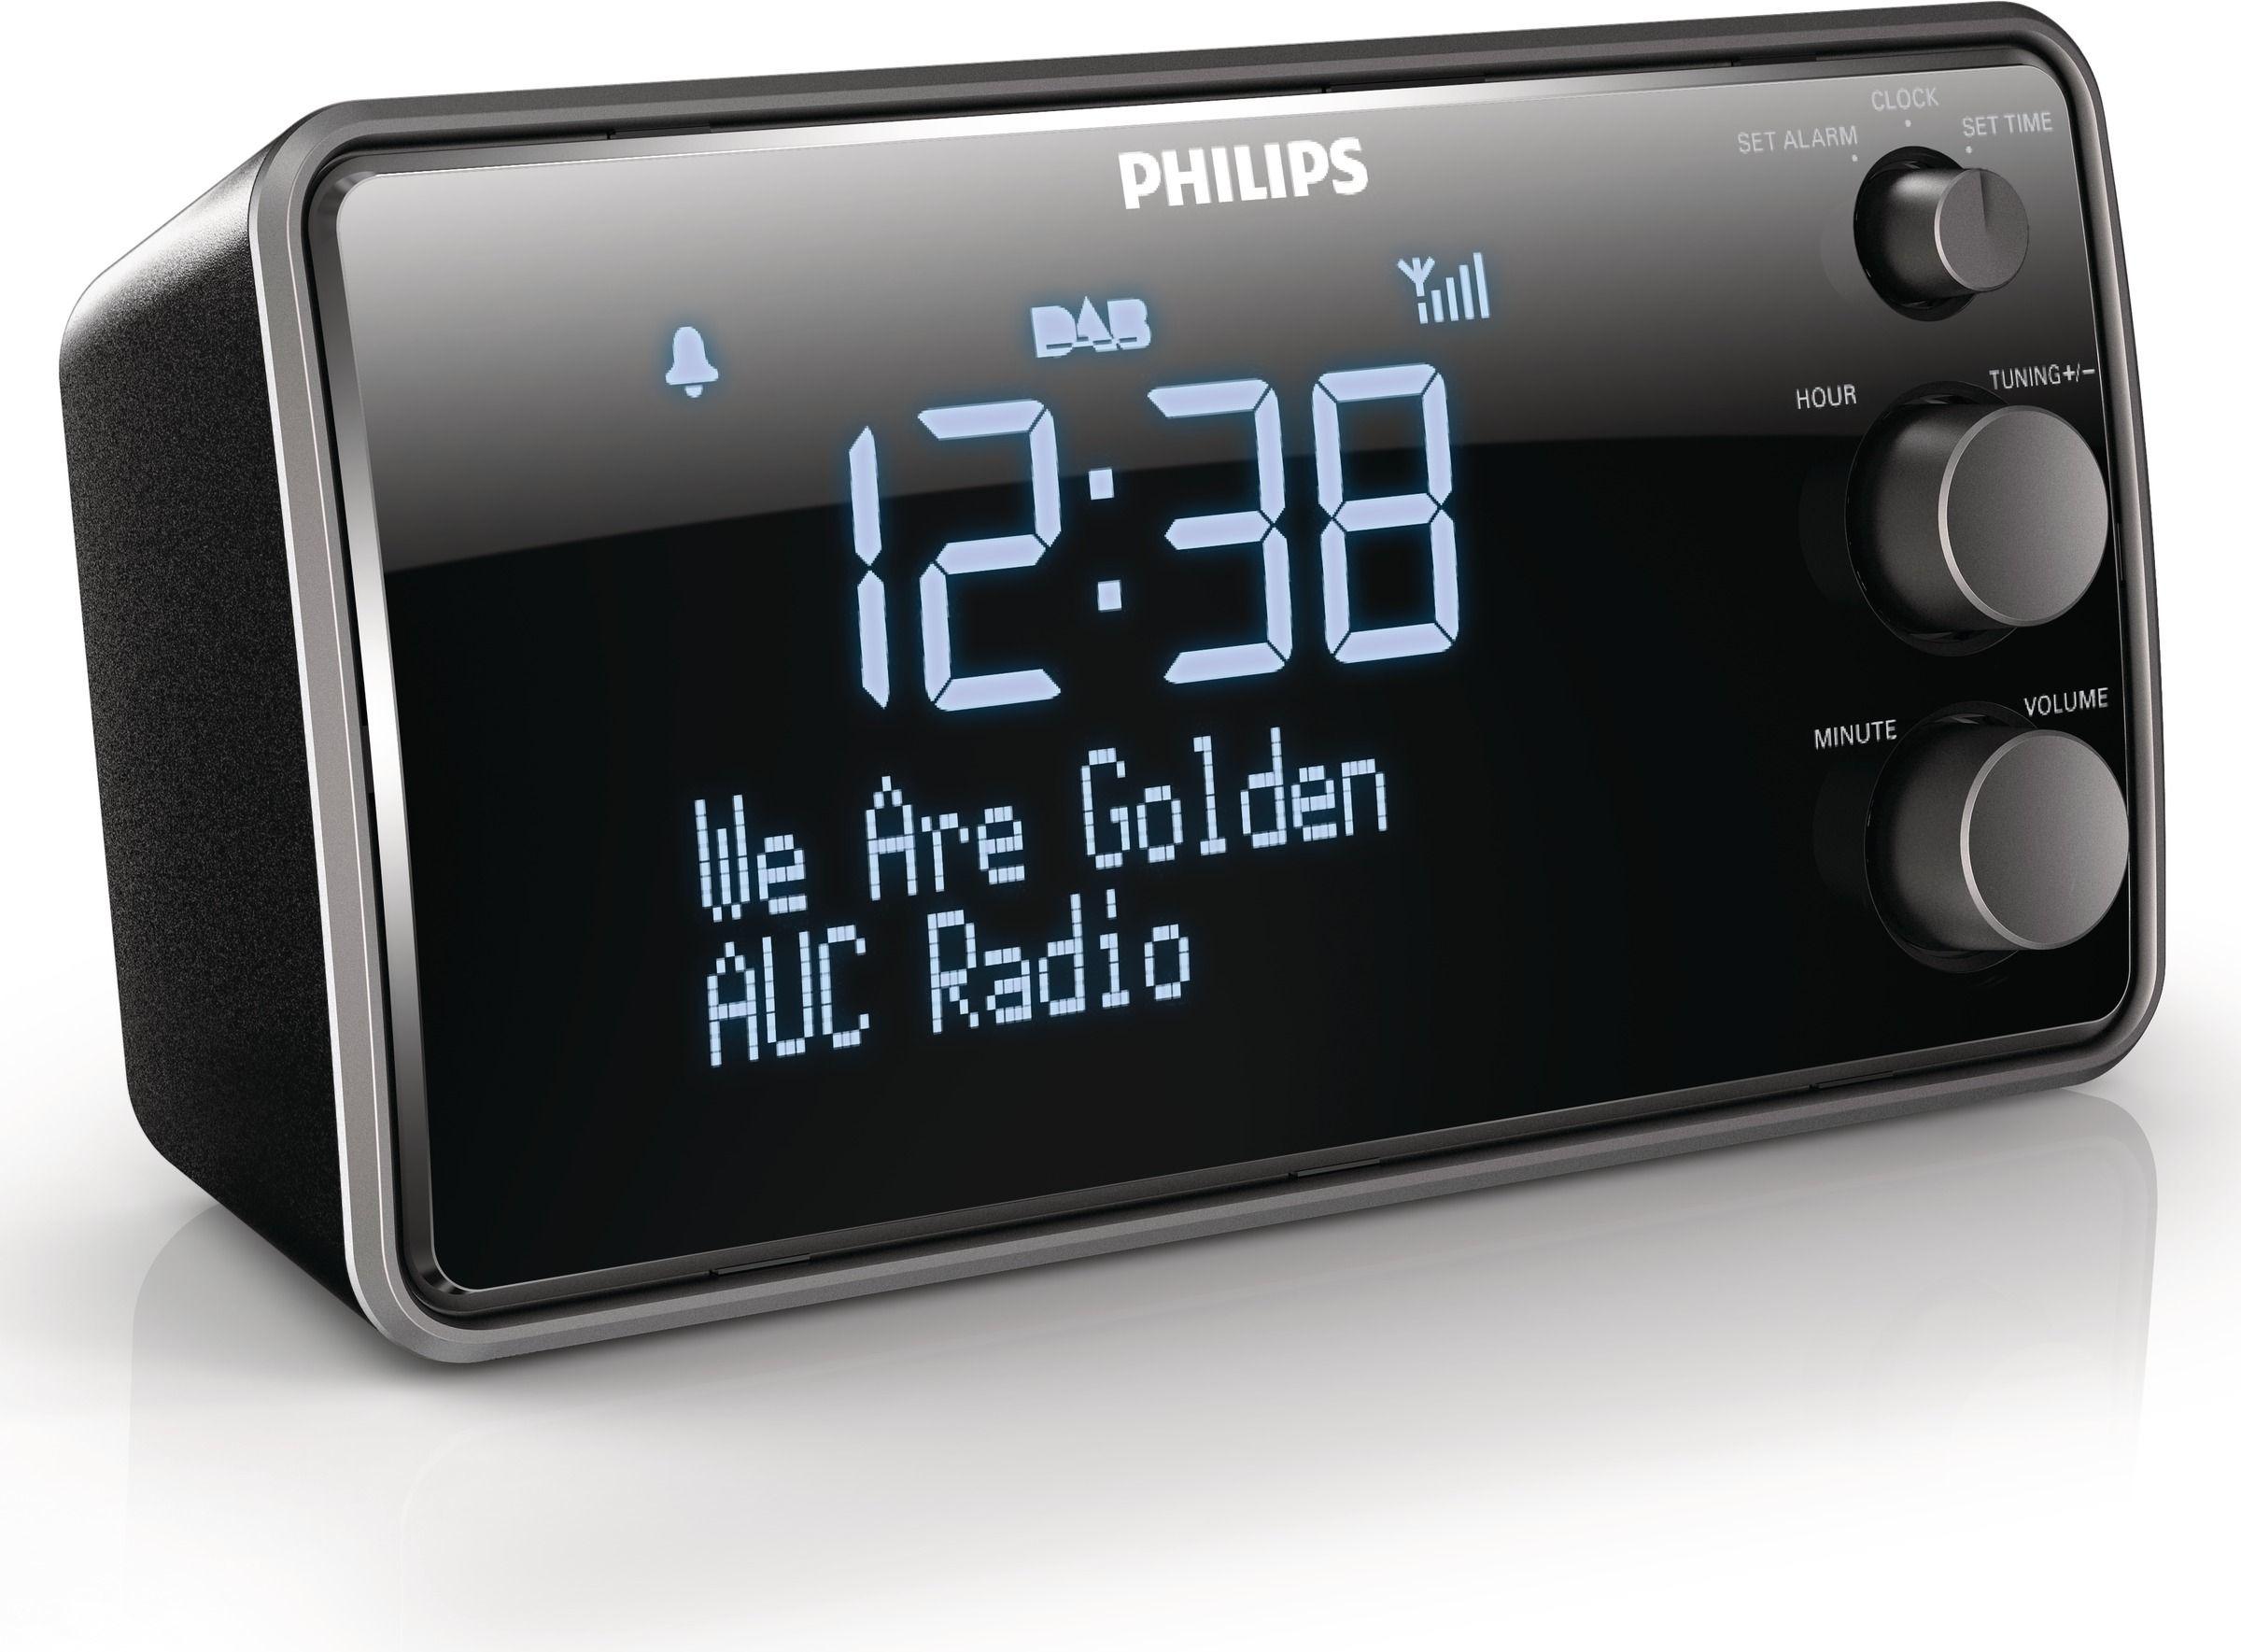 Philips AJB3552 Wekker radio